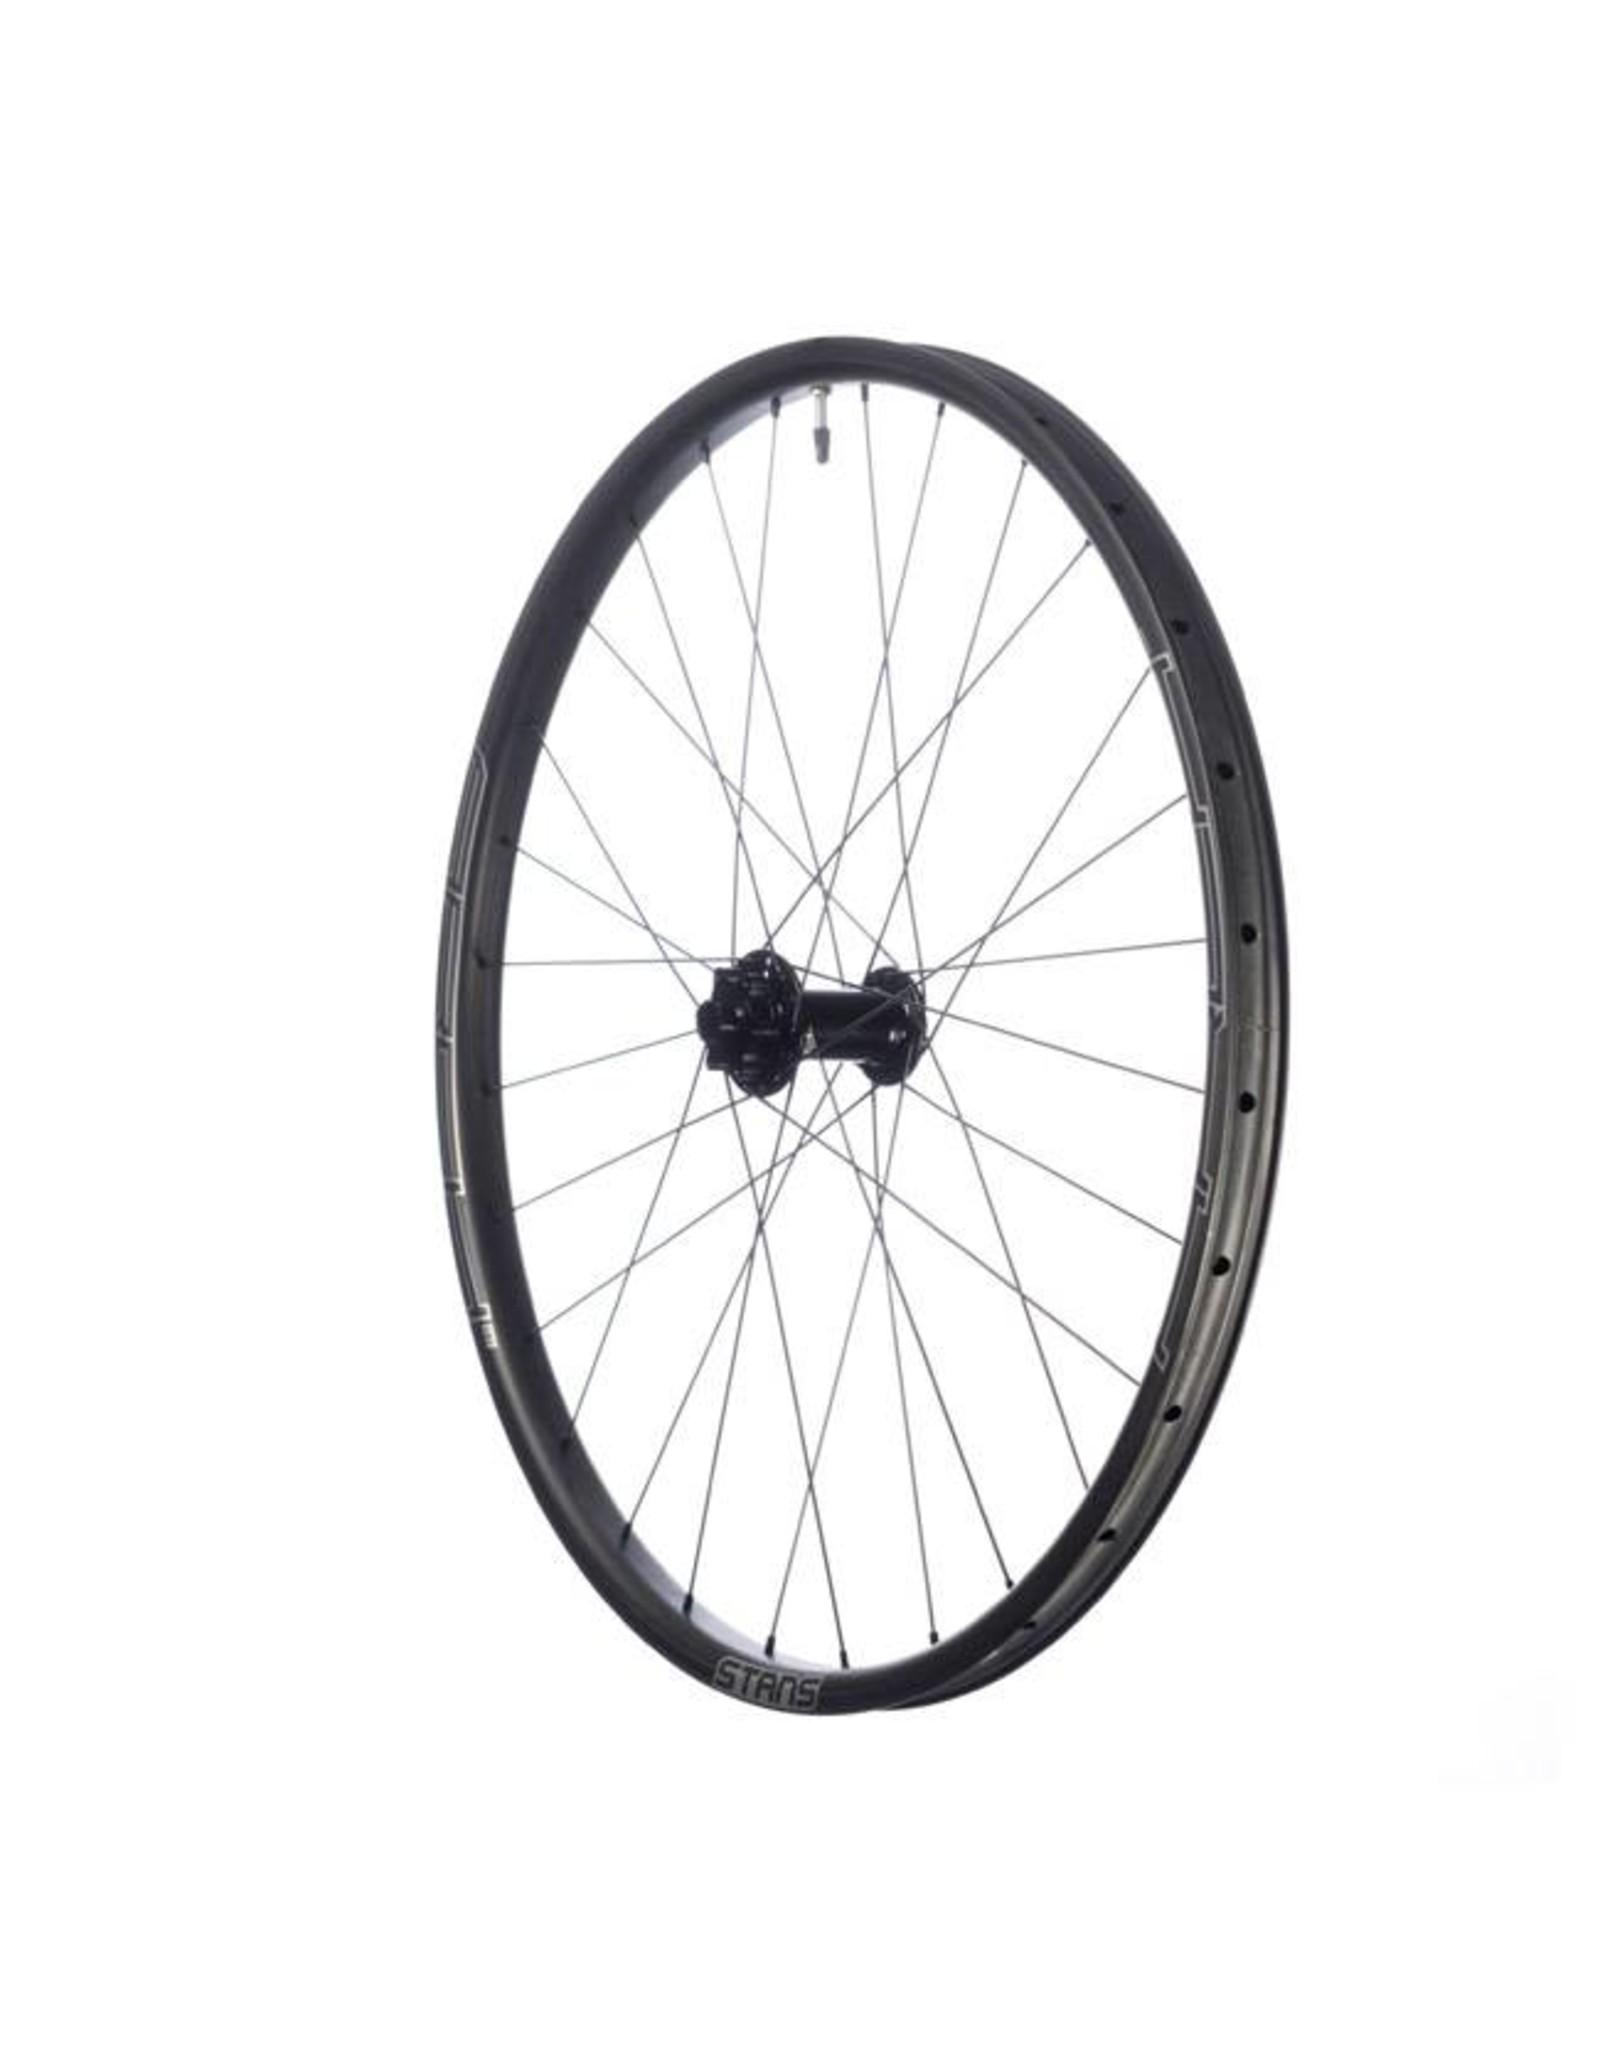 "Stan's No Tubes Stan's No Tubes Arch CB7 Rear Wheel: 27.5"" Carbon, 12 x 148mm Boost, 6- Bolt Disc, SRAM XD, Black"